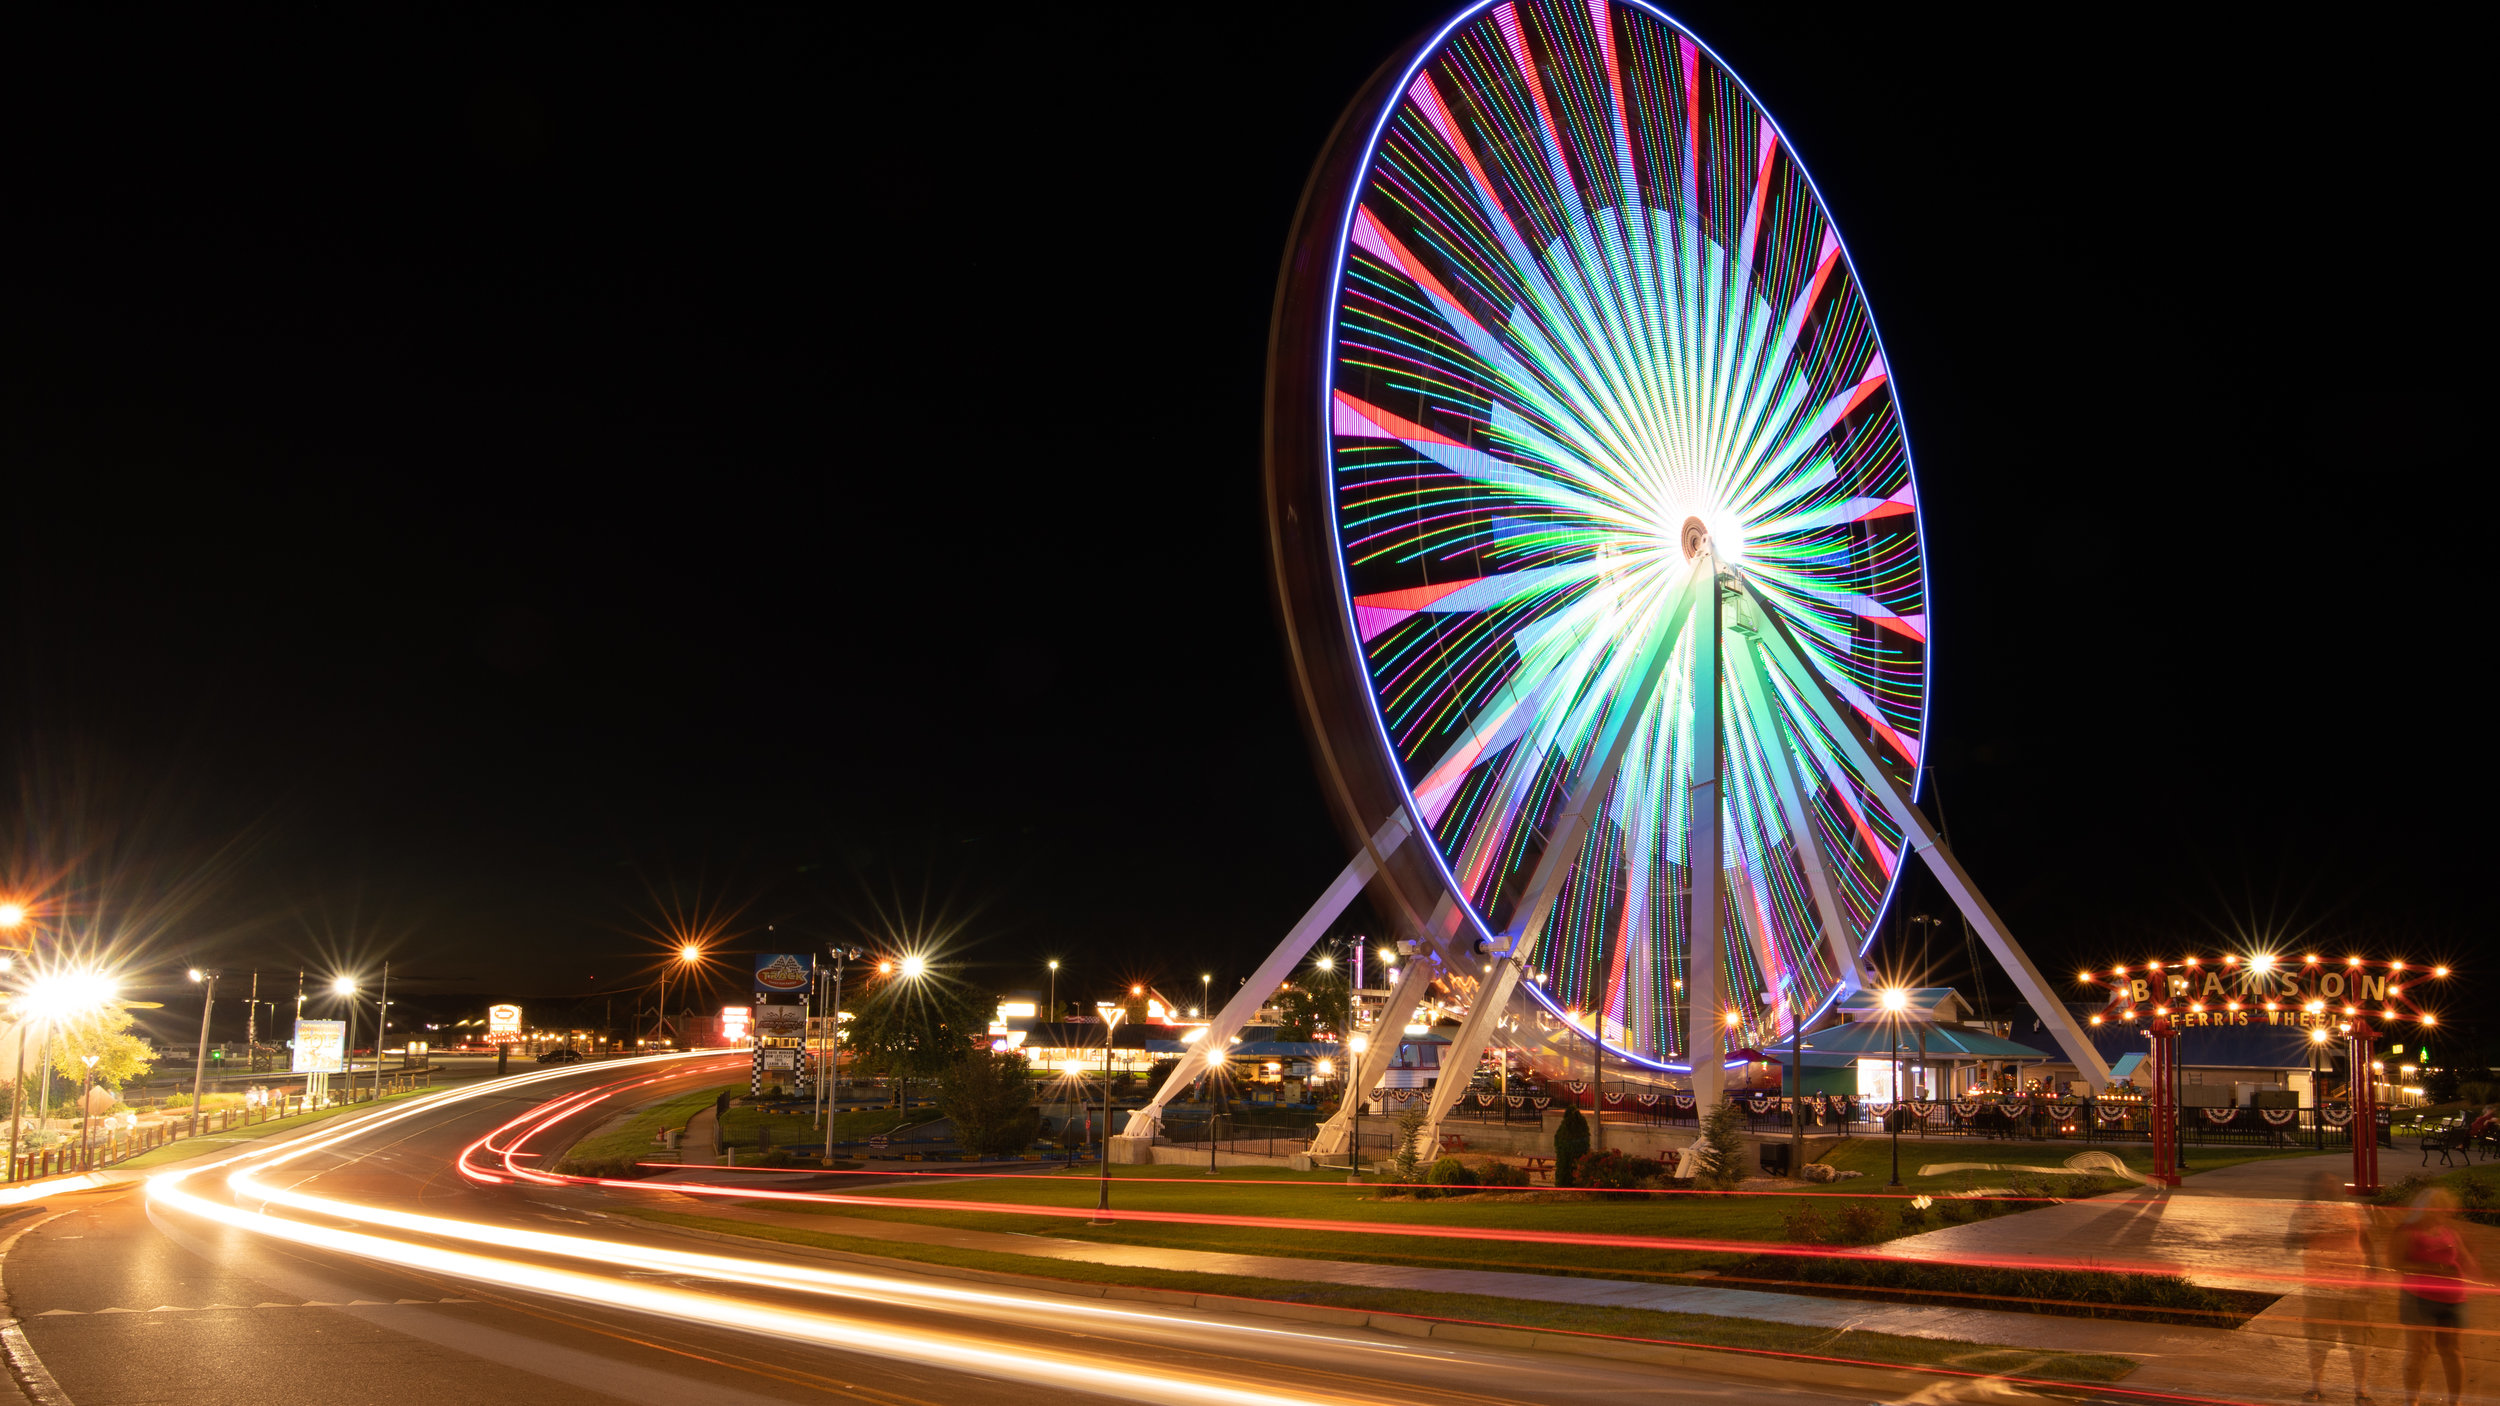 FerrisWheelatNight